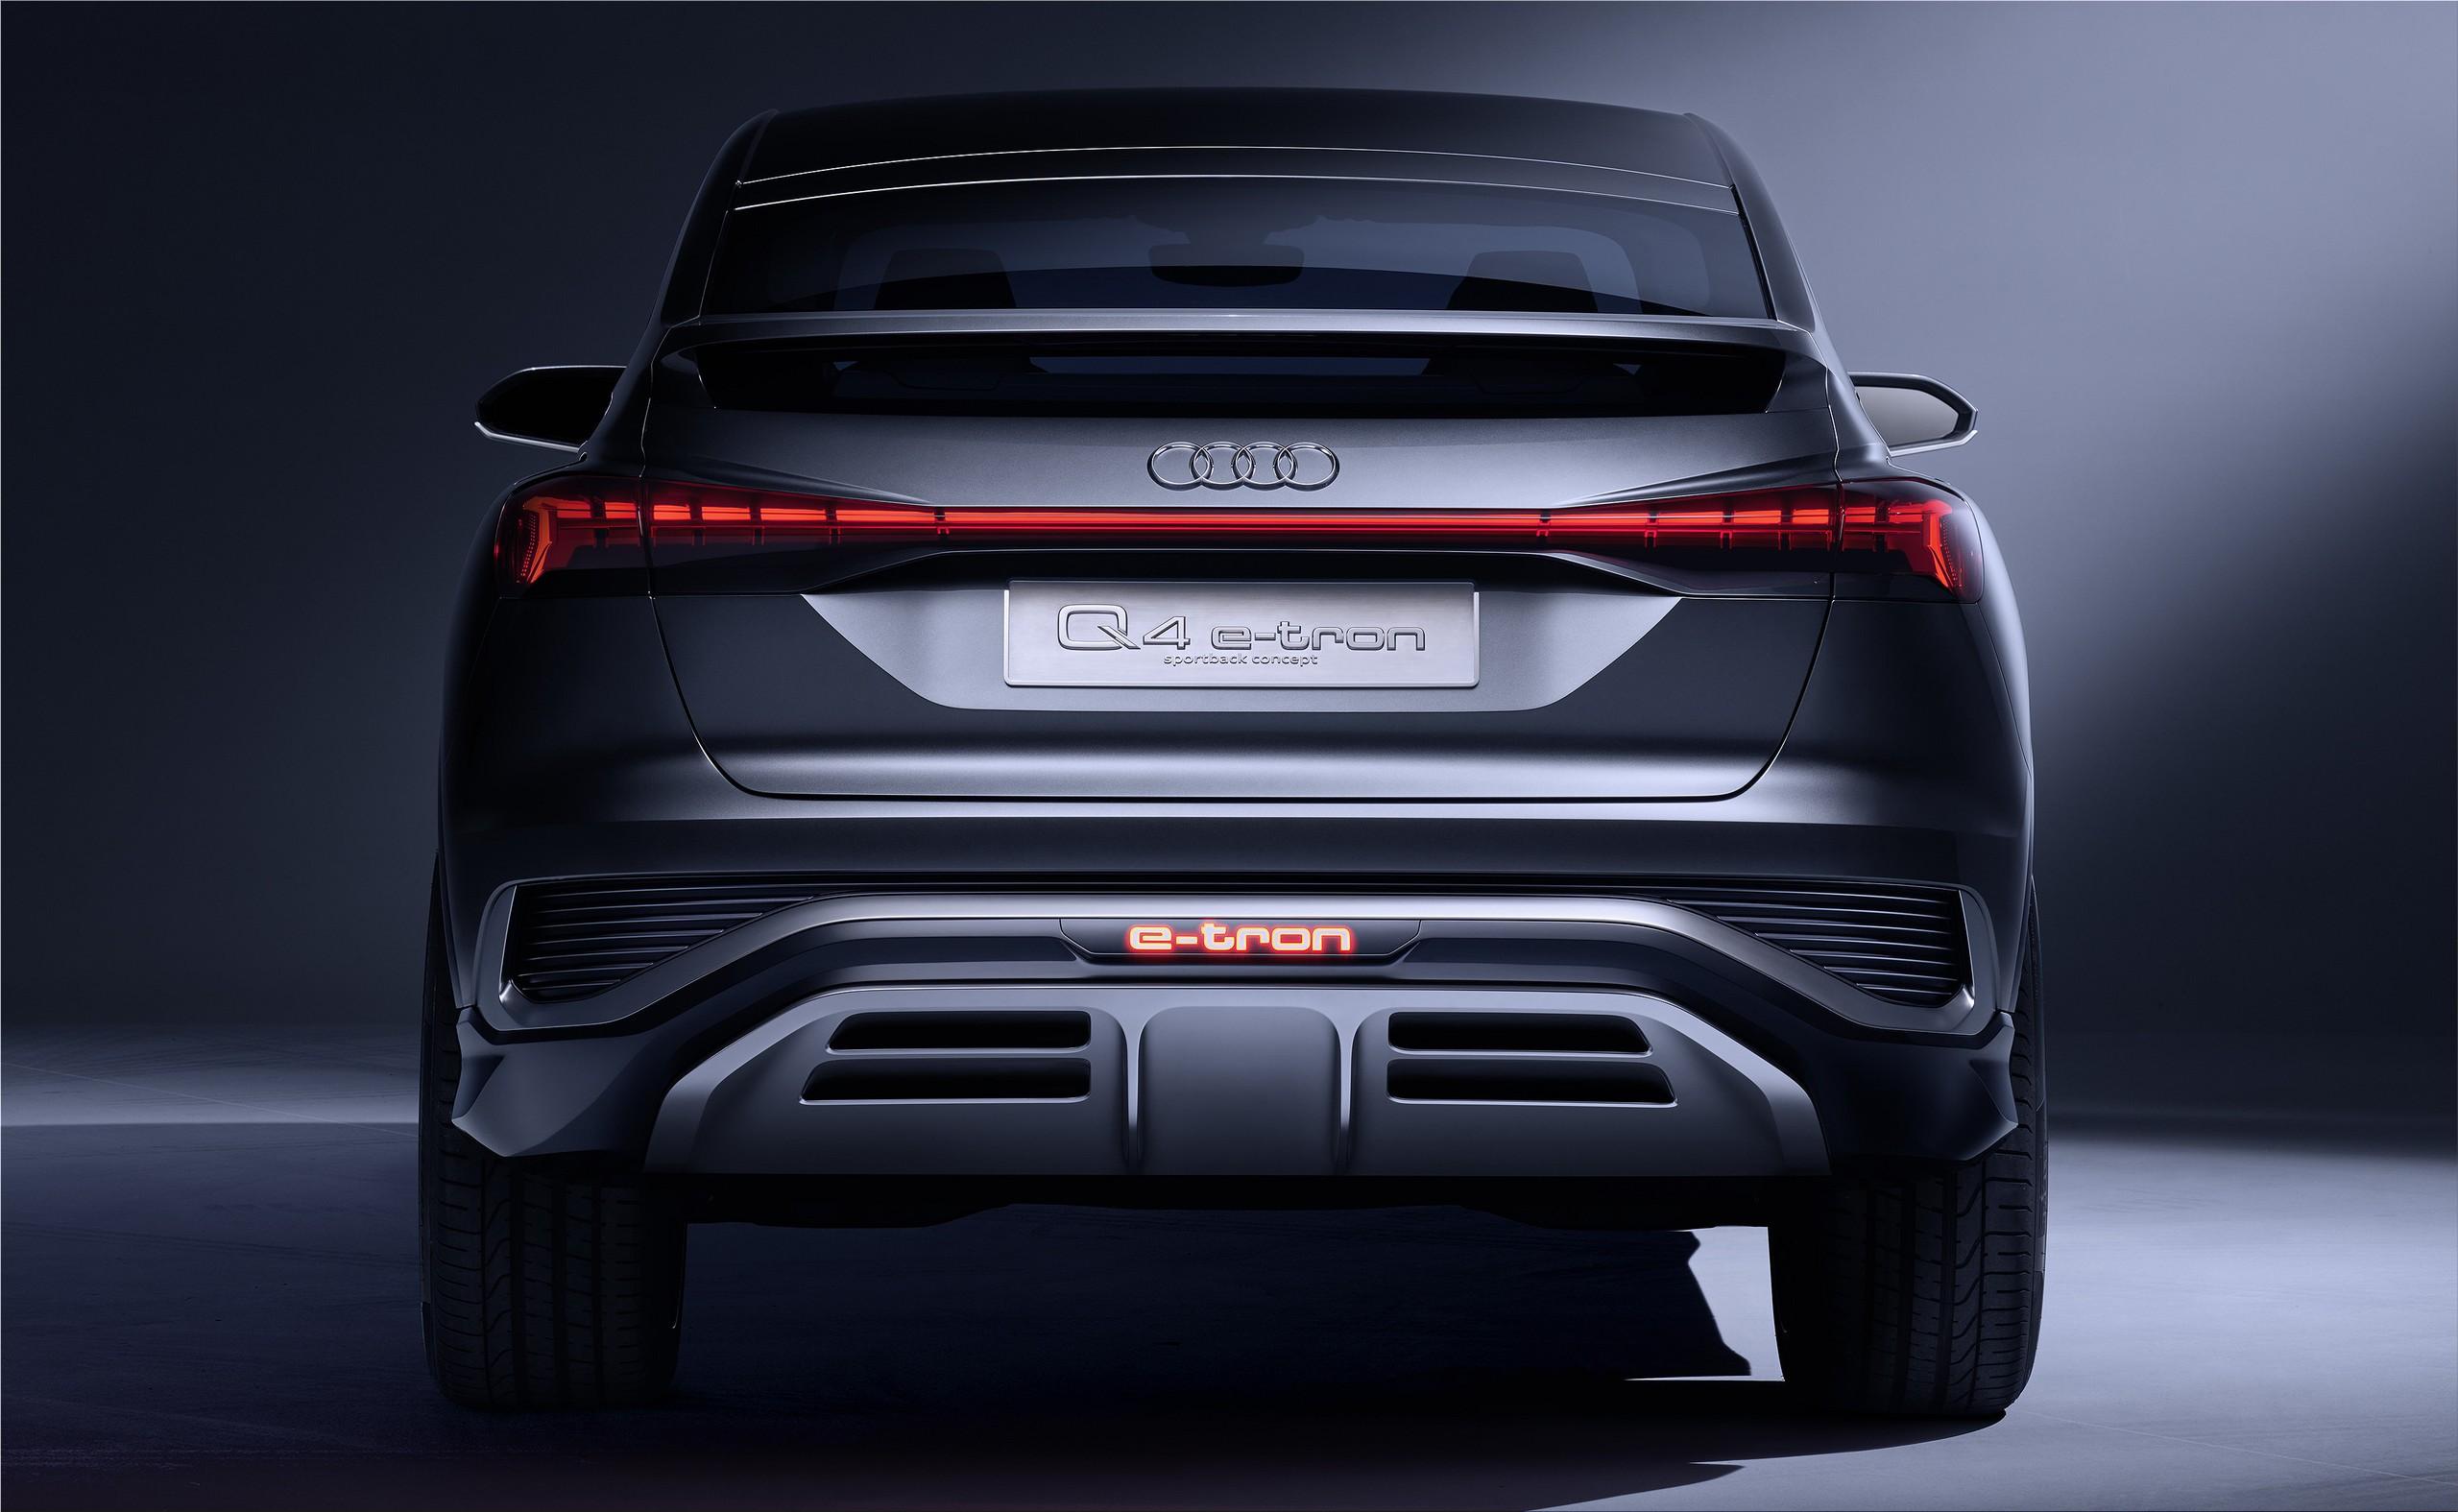 Audi Q4 Sportback E Tron Electric Suv Essential Data Electric Cars Electric Hunter